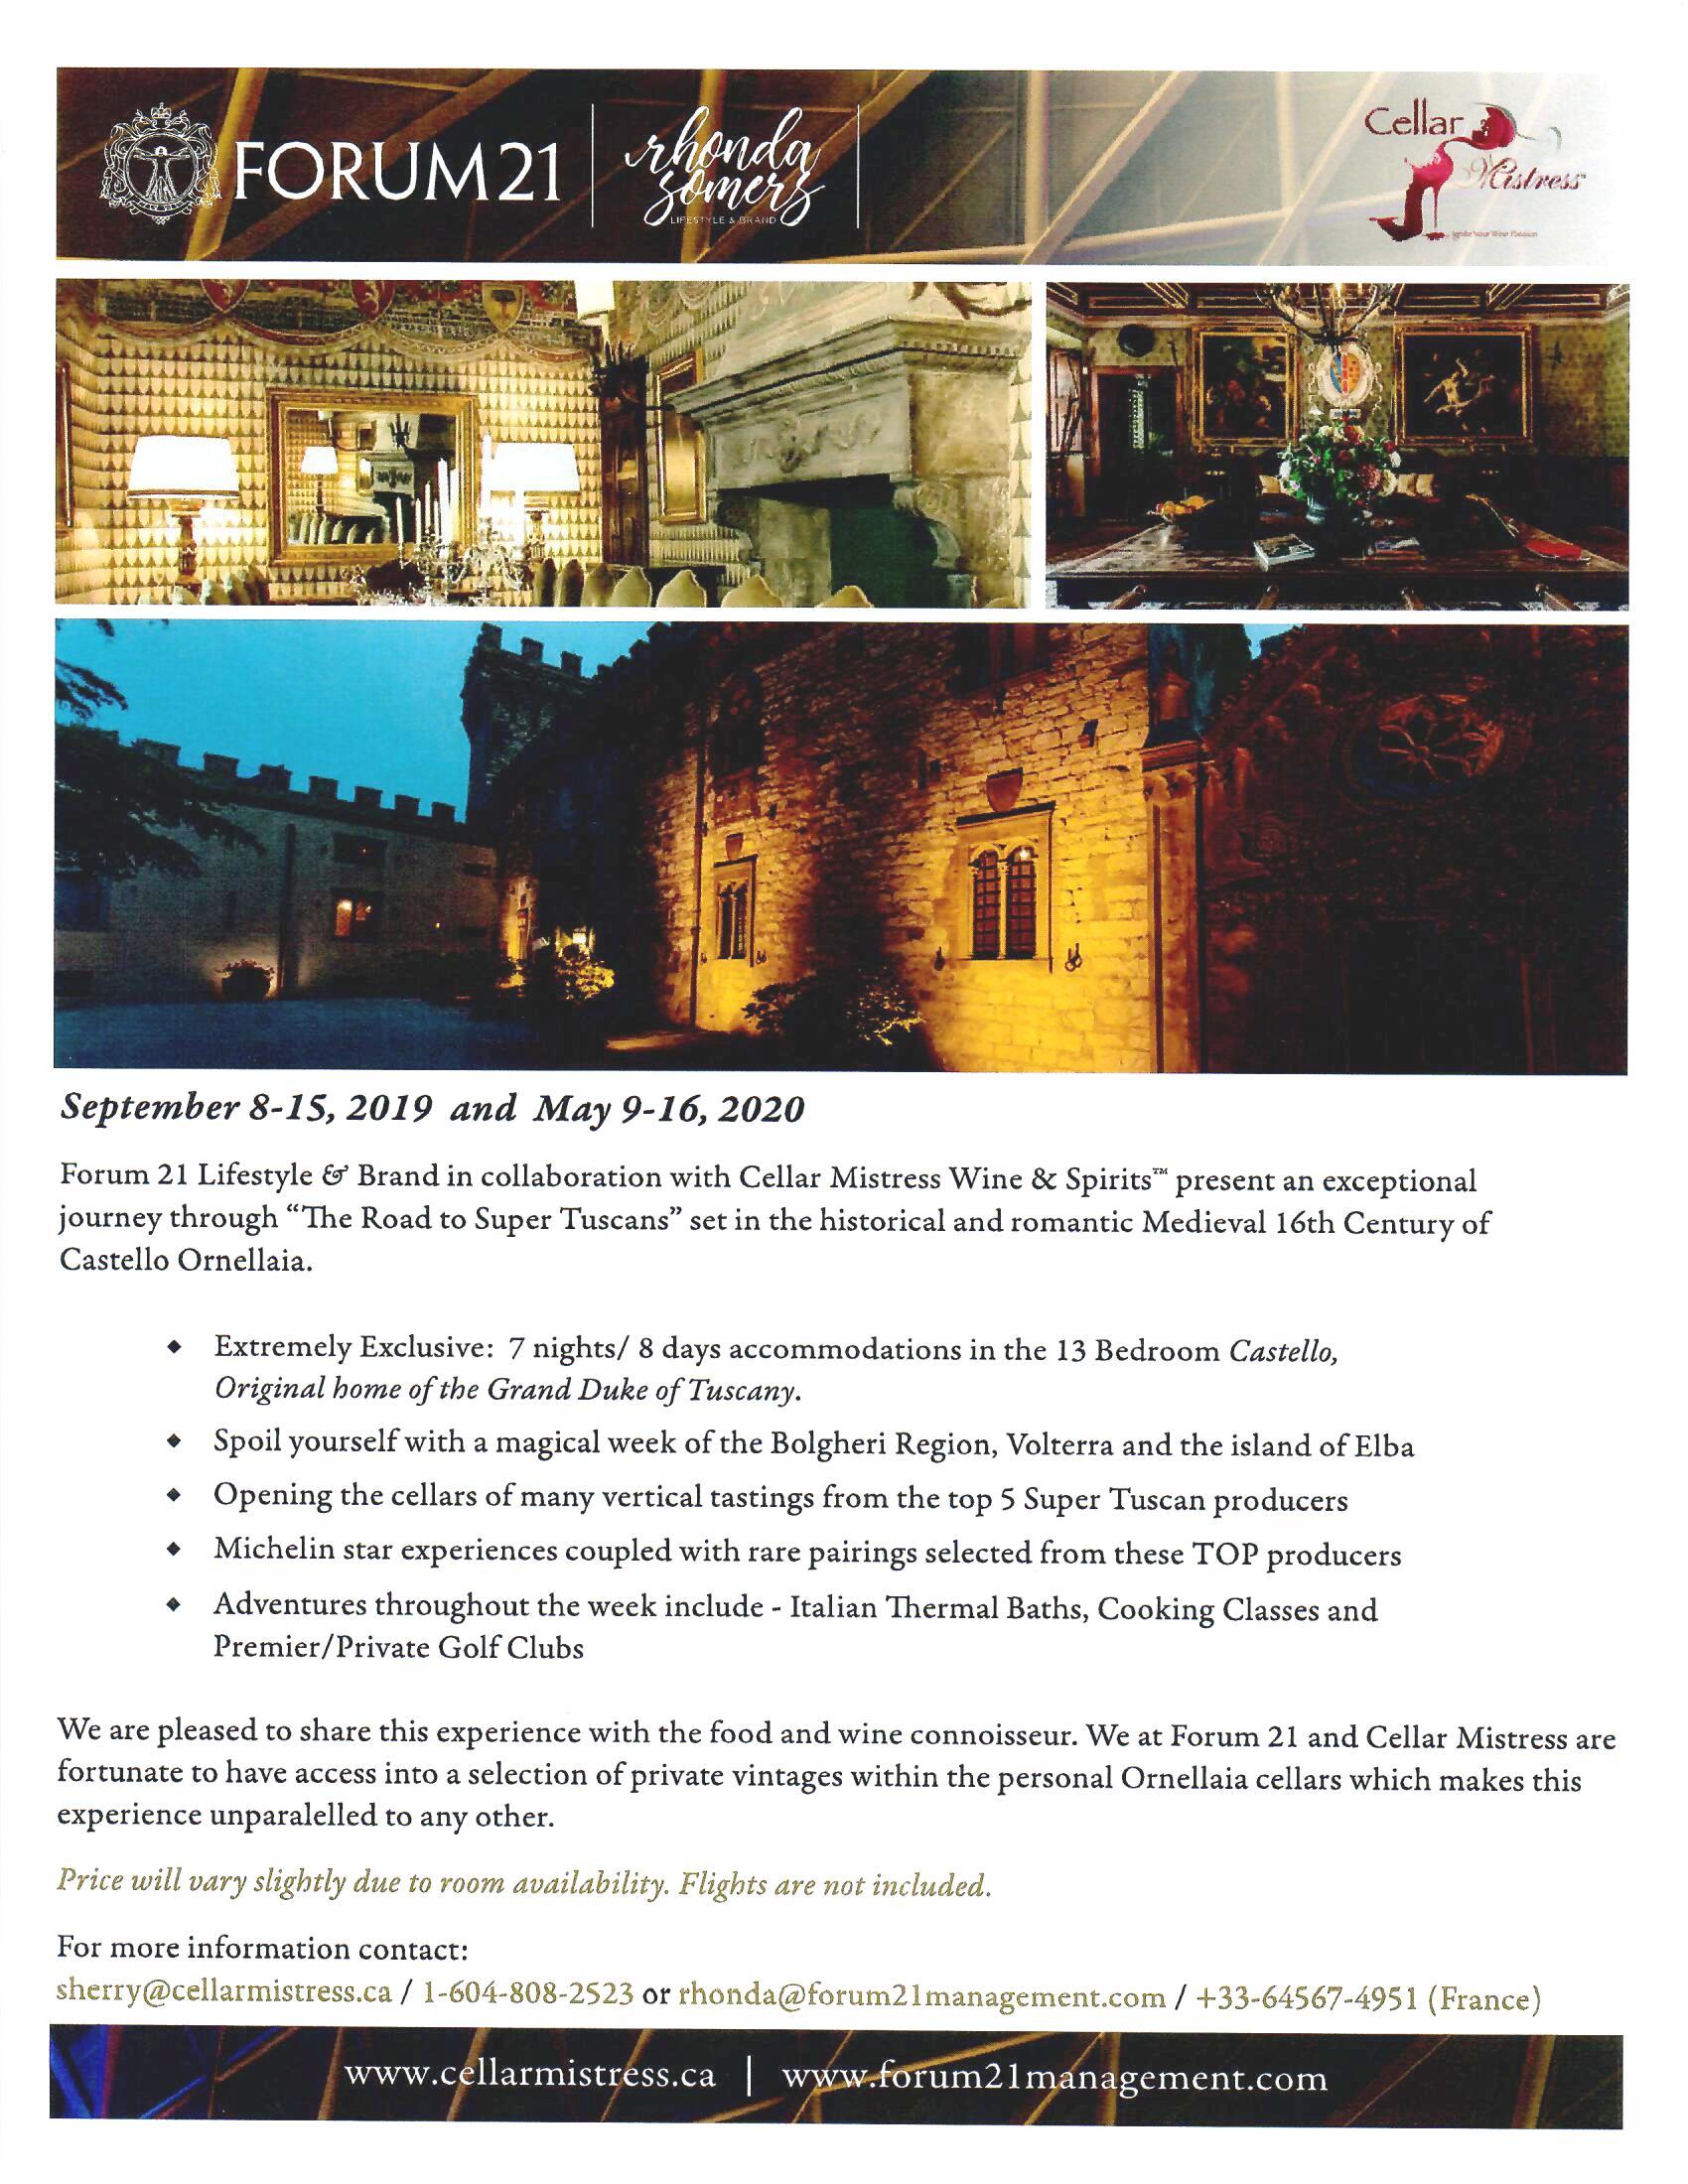 CMWS & Forum 21 Tuscany Event Promo.jpg